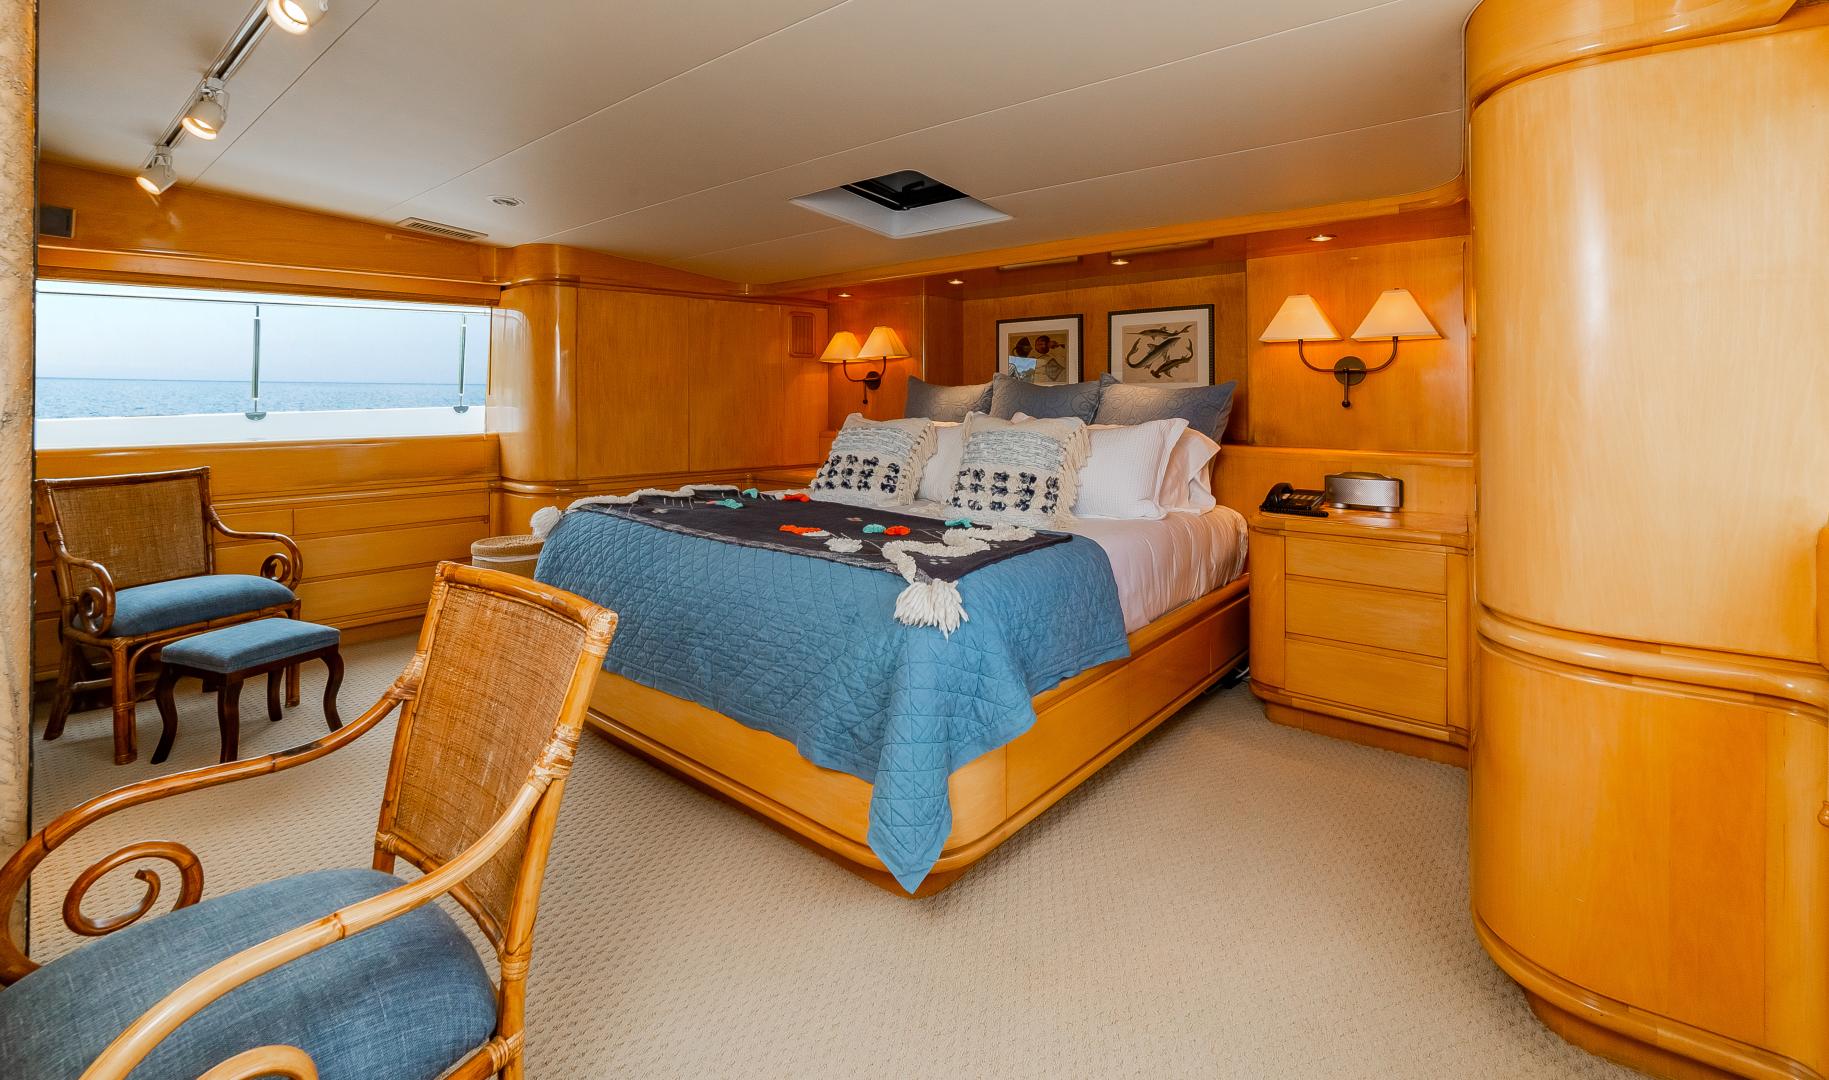 Barattucci-Yachtfisher 1992-STEADFAST Seattle-Washington-United States-MASTER STATEROOM-1284166 | Thumbnail